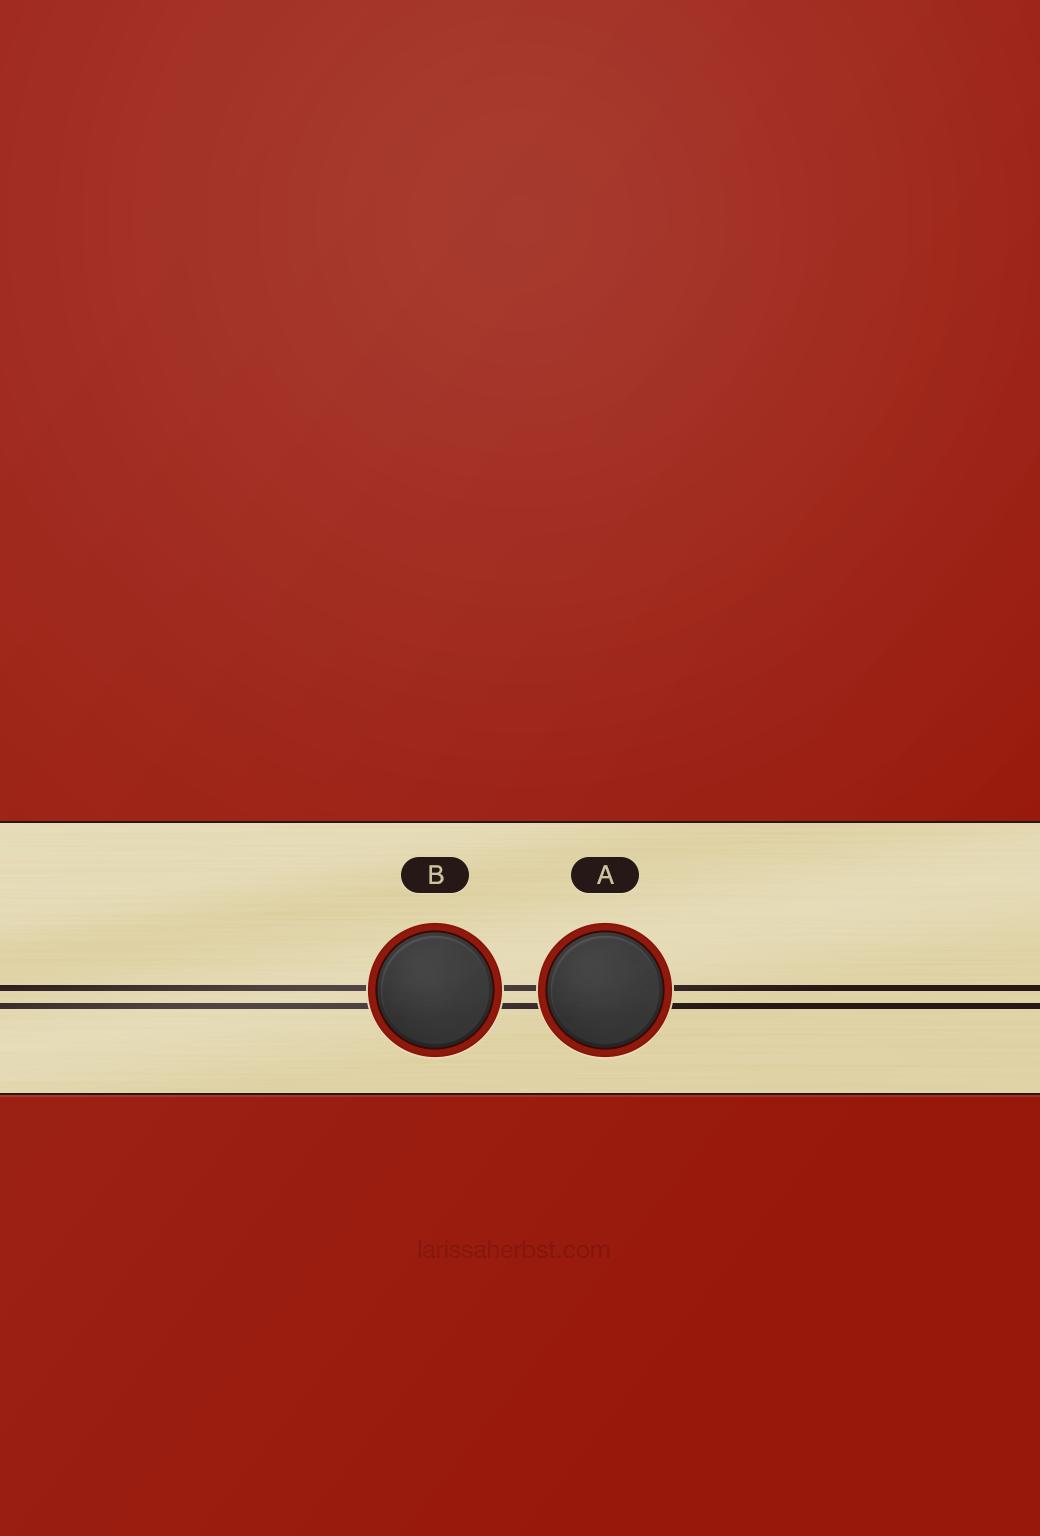 Classic Nintendo Wallpaper iPhone et iPad 1040x1536